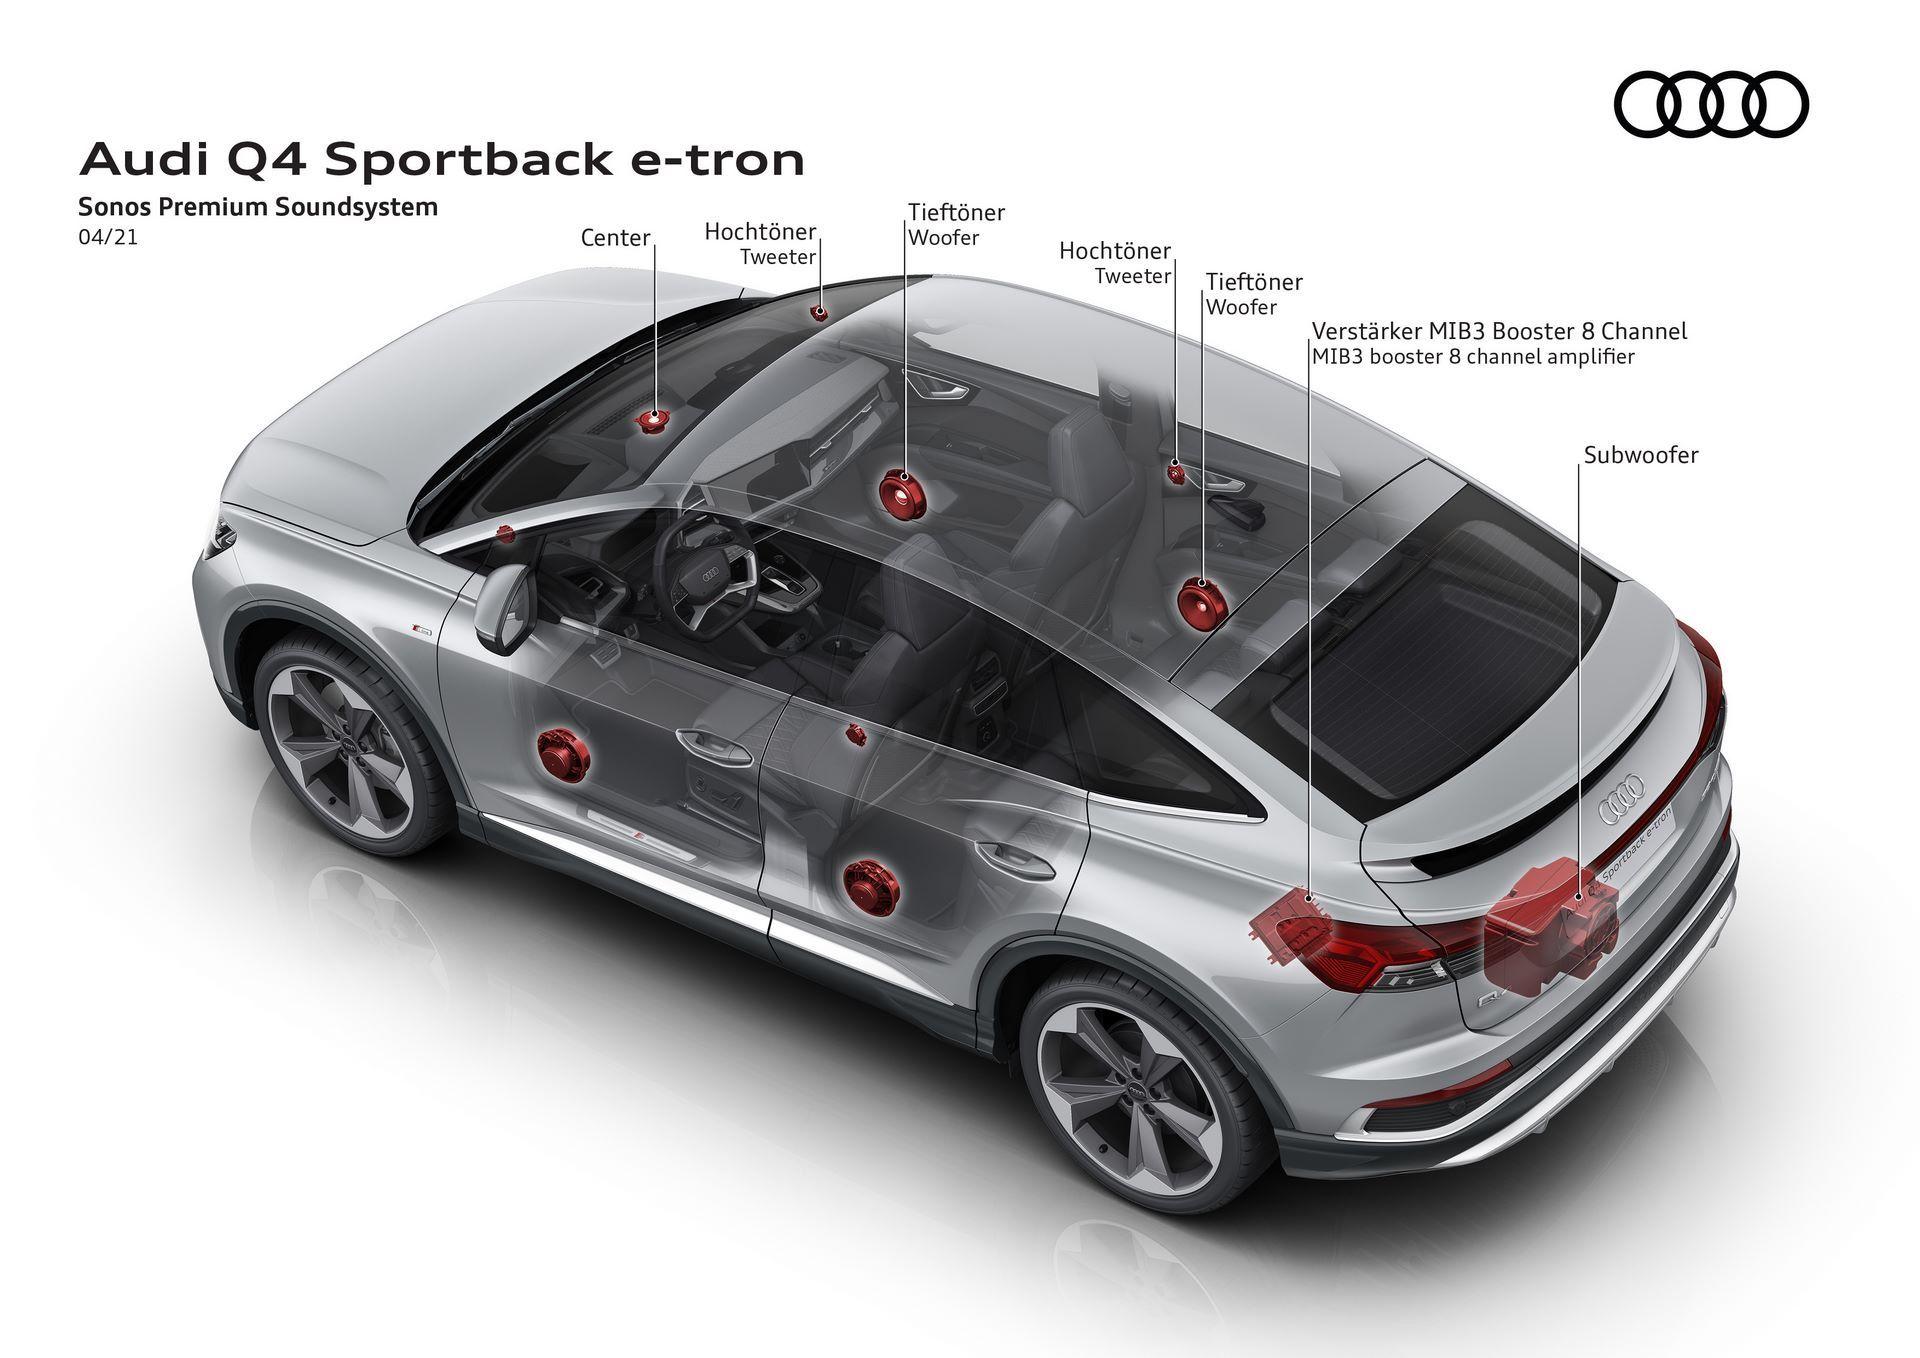 Audi-Q4-e-tron-and-Q4-e-tron-Sportback-137